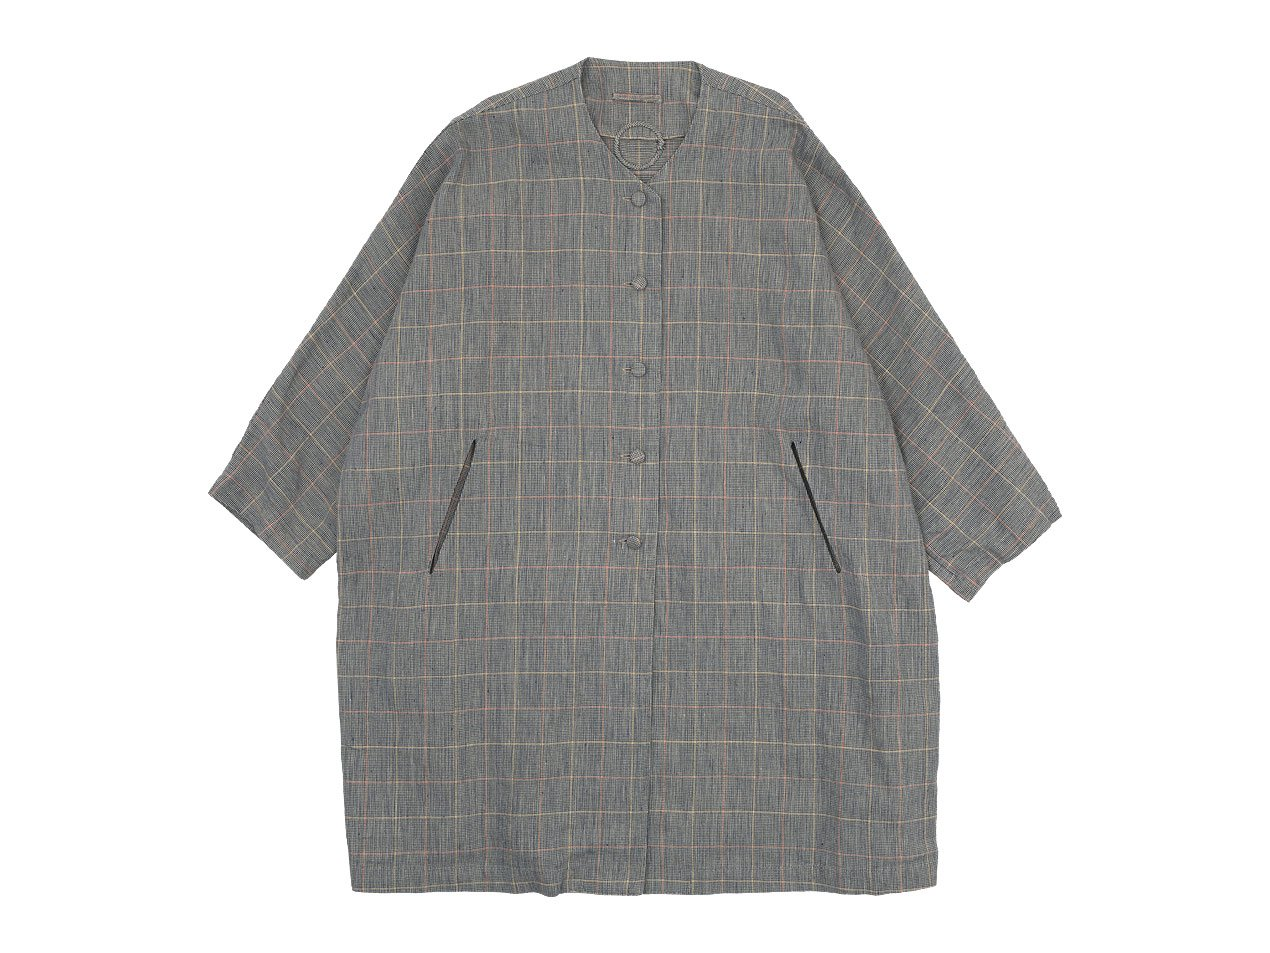 Lin francais d'antan Verlaine(ヴェルレーヌ) Oversaized Coat Cotton Linen NAVY CHECK